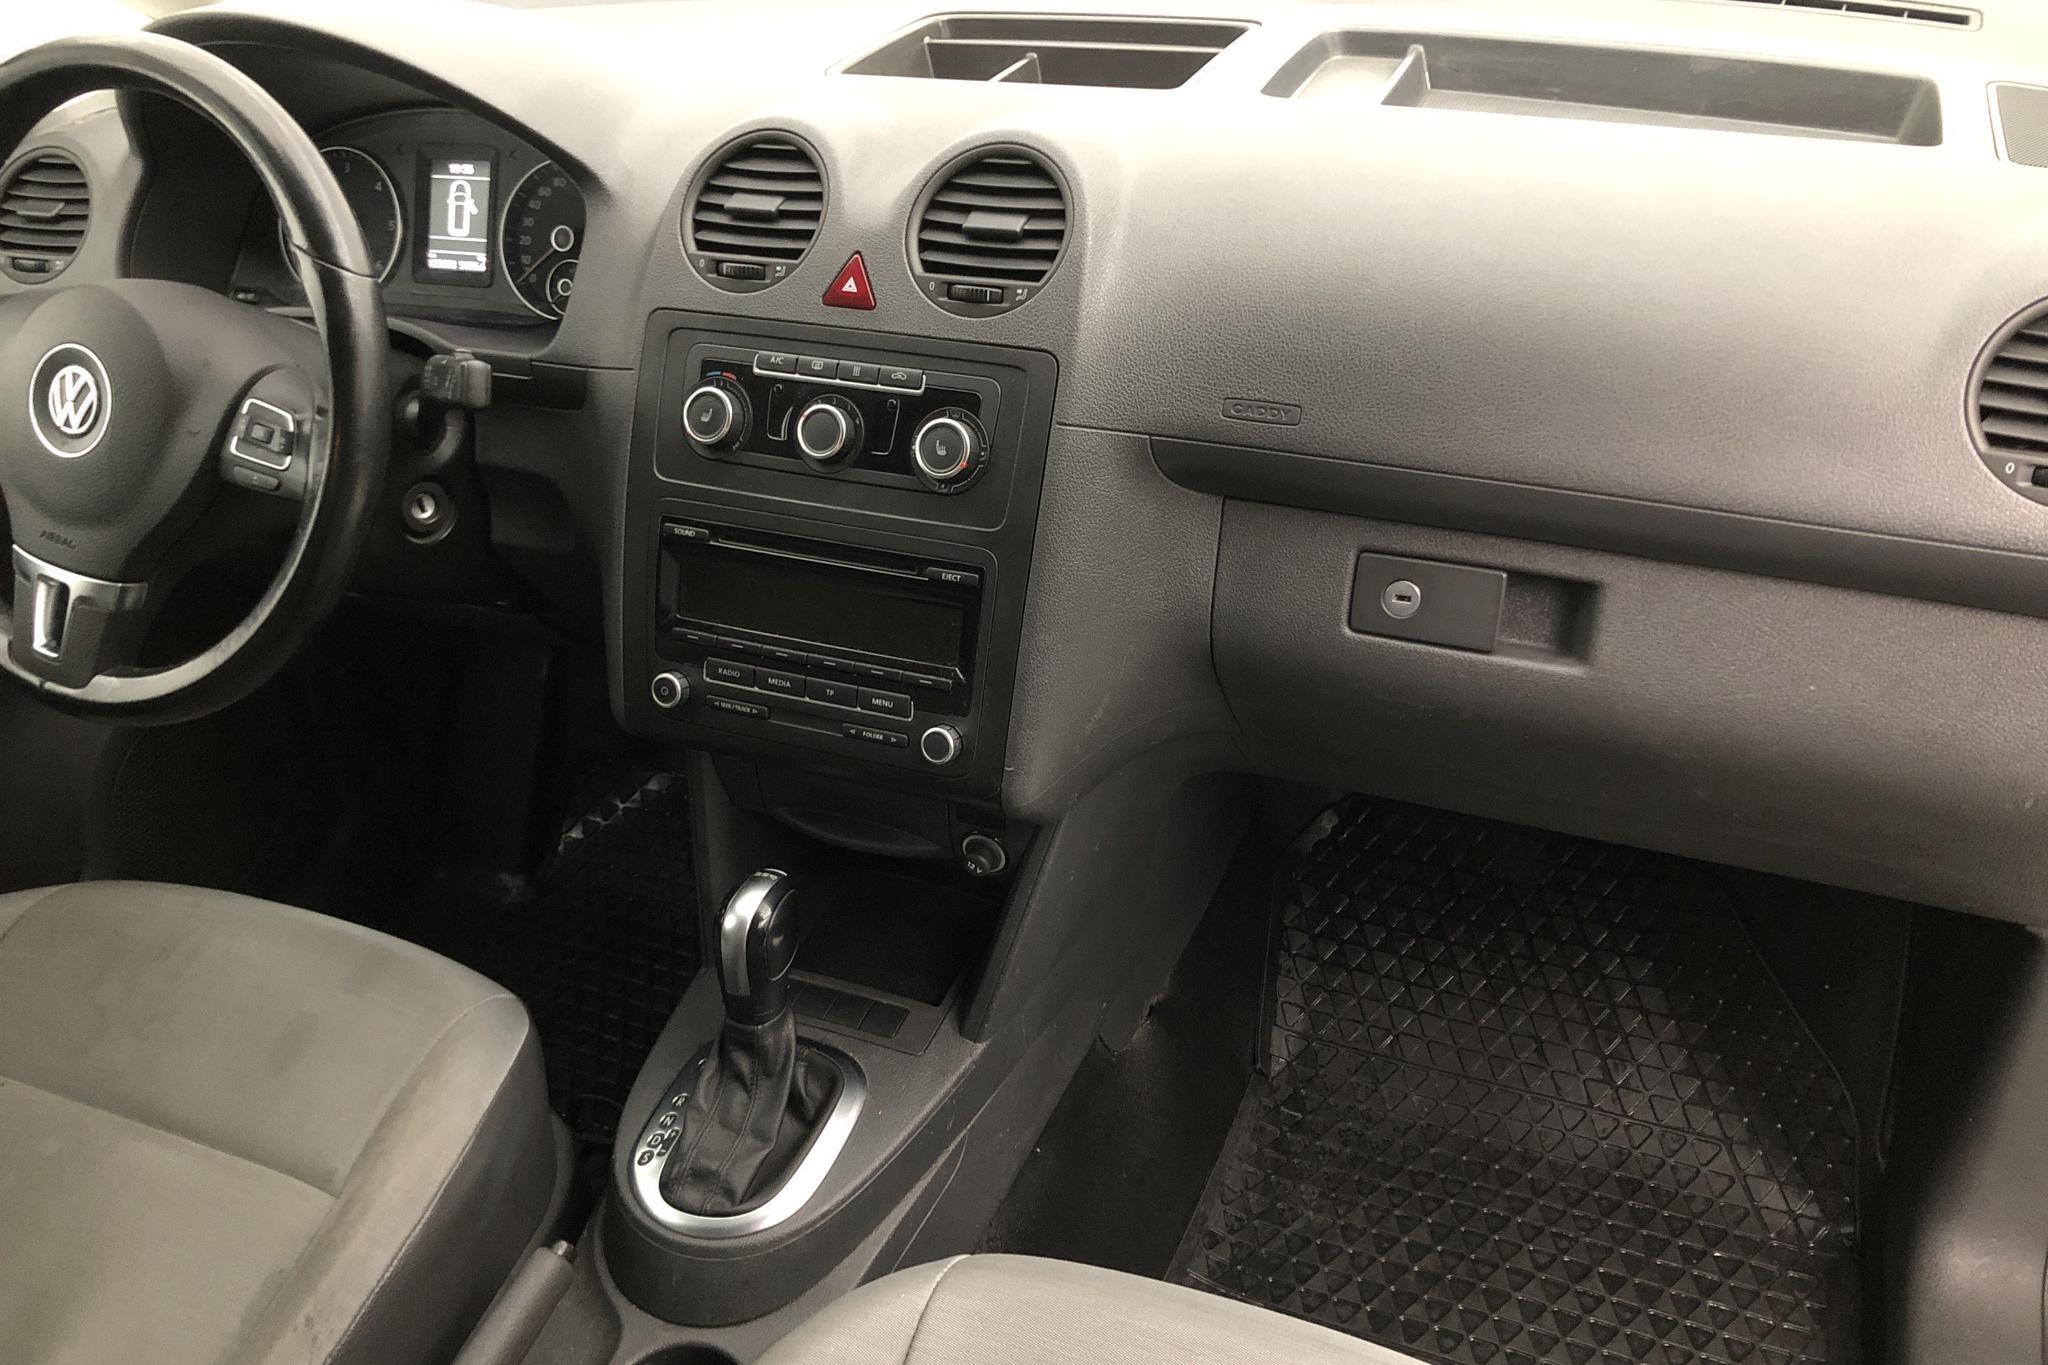 VW Caddy 1.6 TDI Maxi Skåp (102hk) - 0 km - Automatic - white - 2015